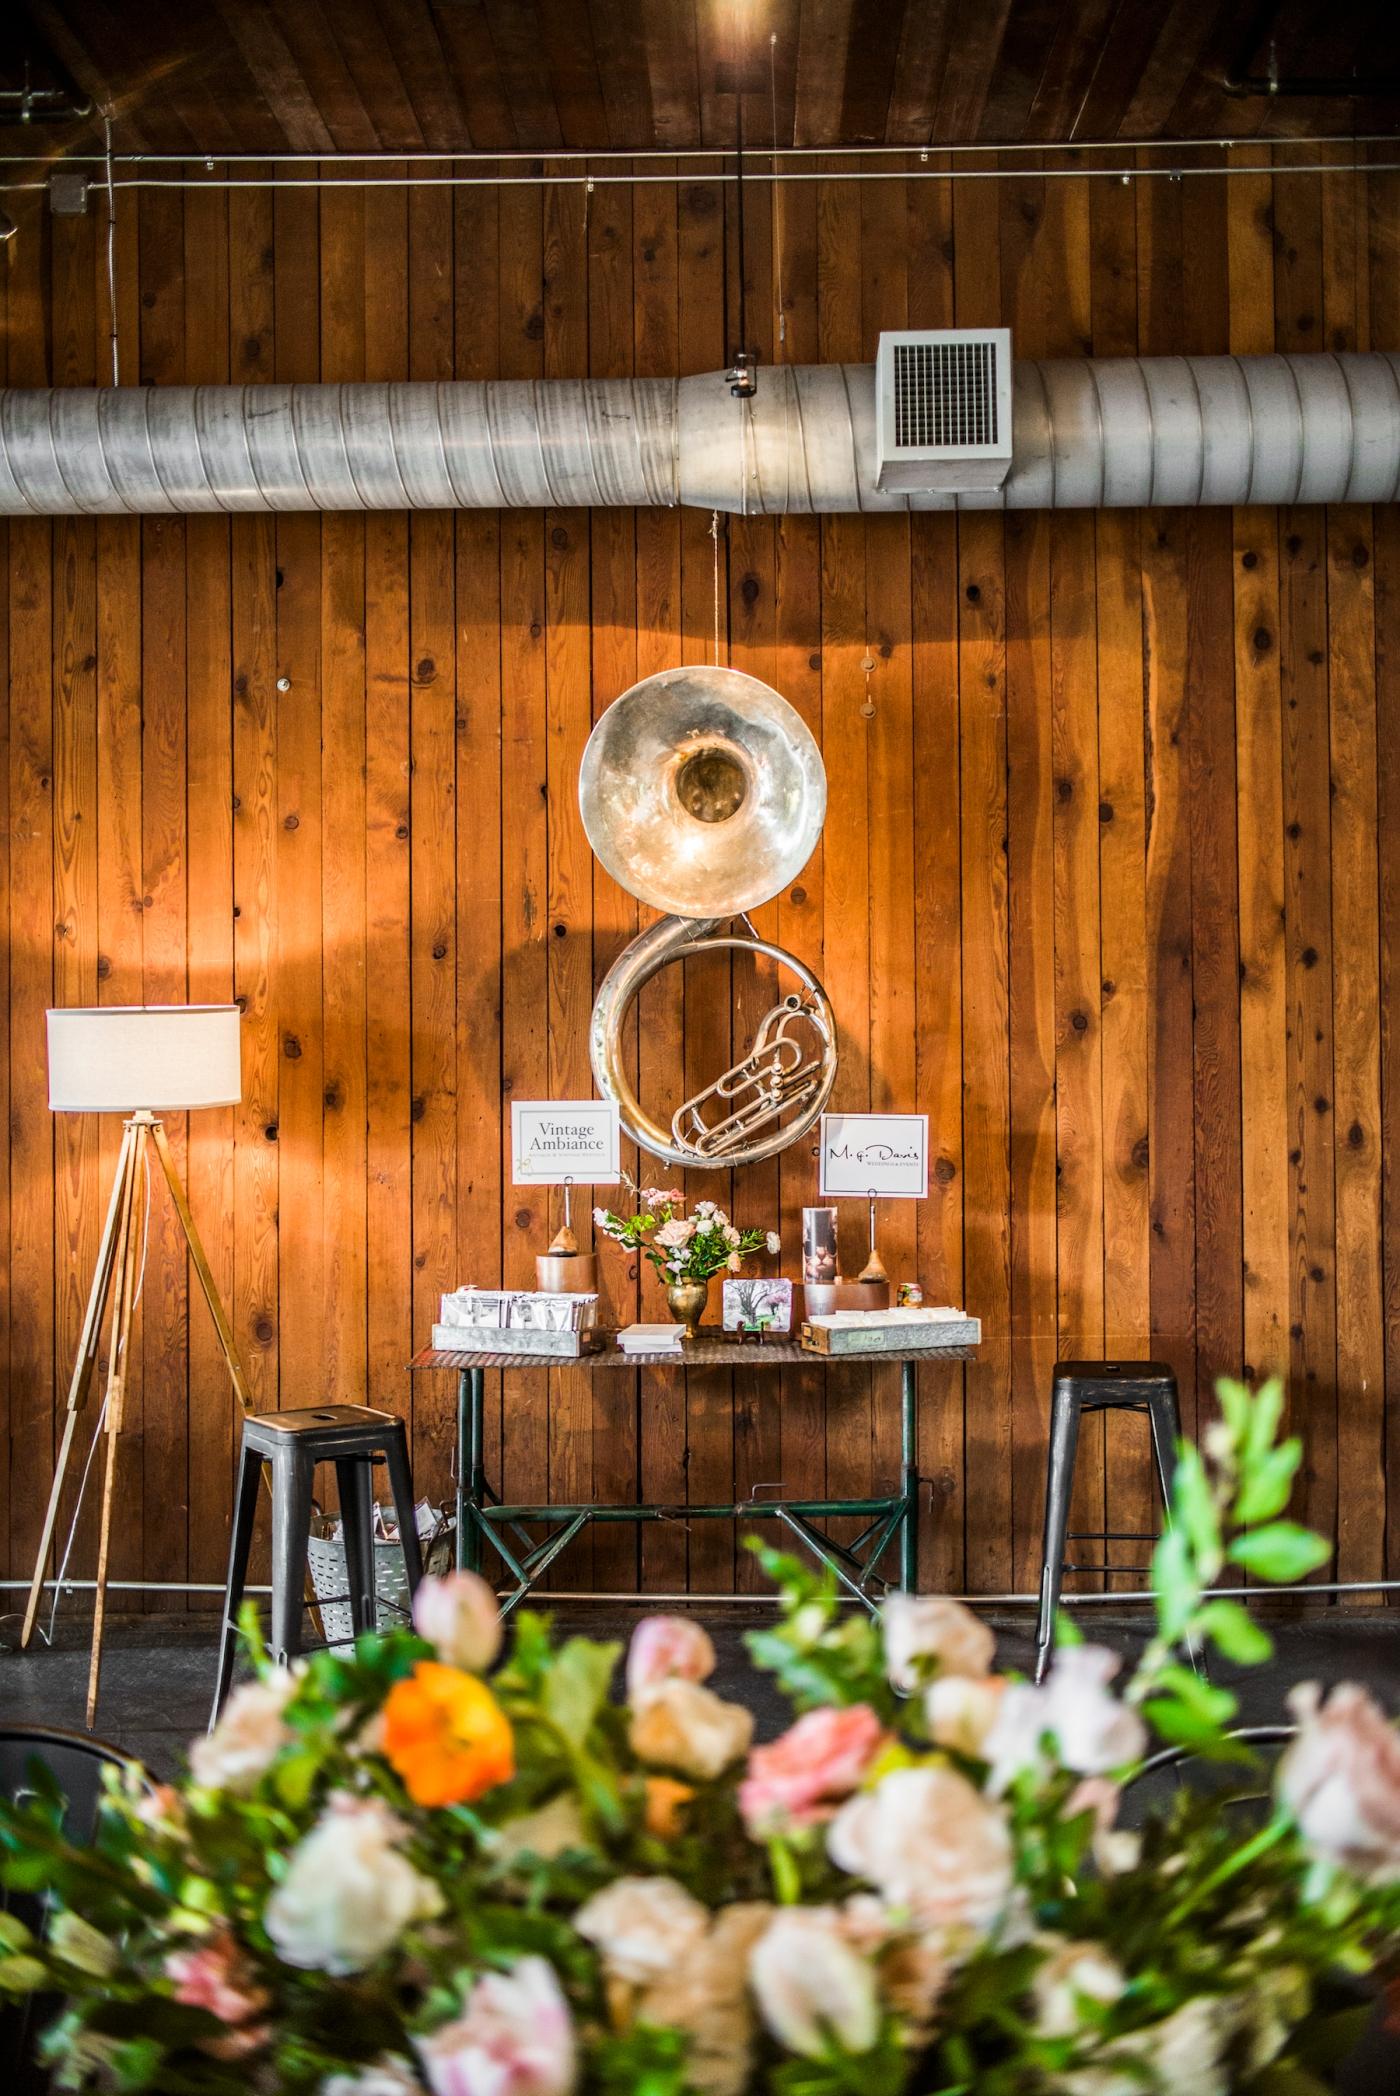 photography_by_jane_speleers_2017_wedding_show_i_do_sodo_within_designed_by_melody_davisdsc_0338